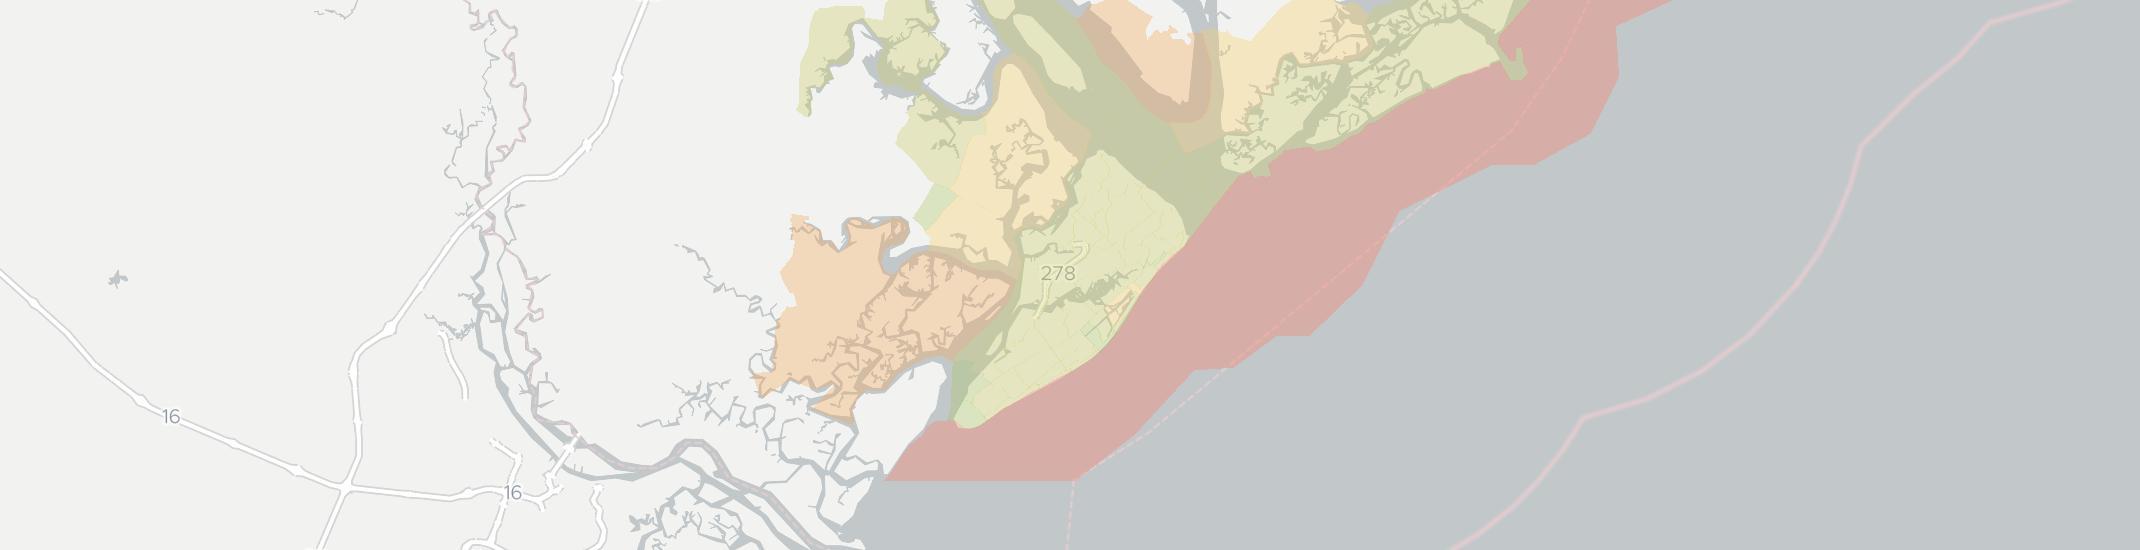 Hilton Head Island South Carolina Map.Internet Providers In Hilton Head Island Compare 14 Providers